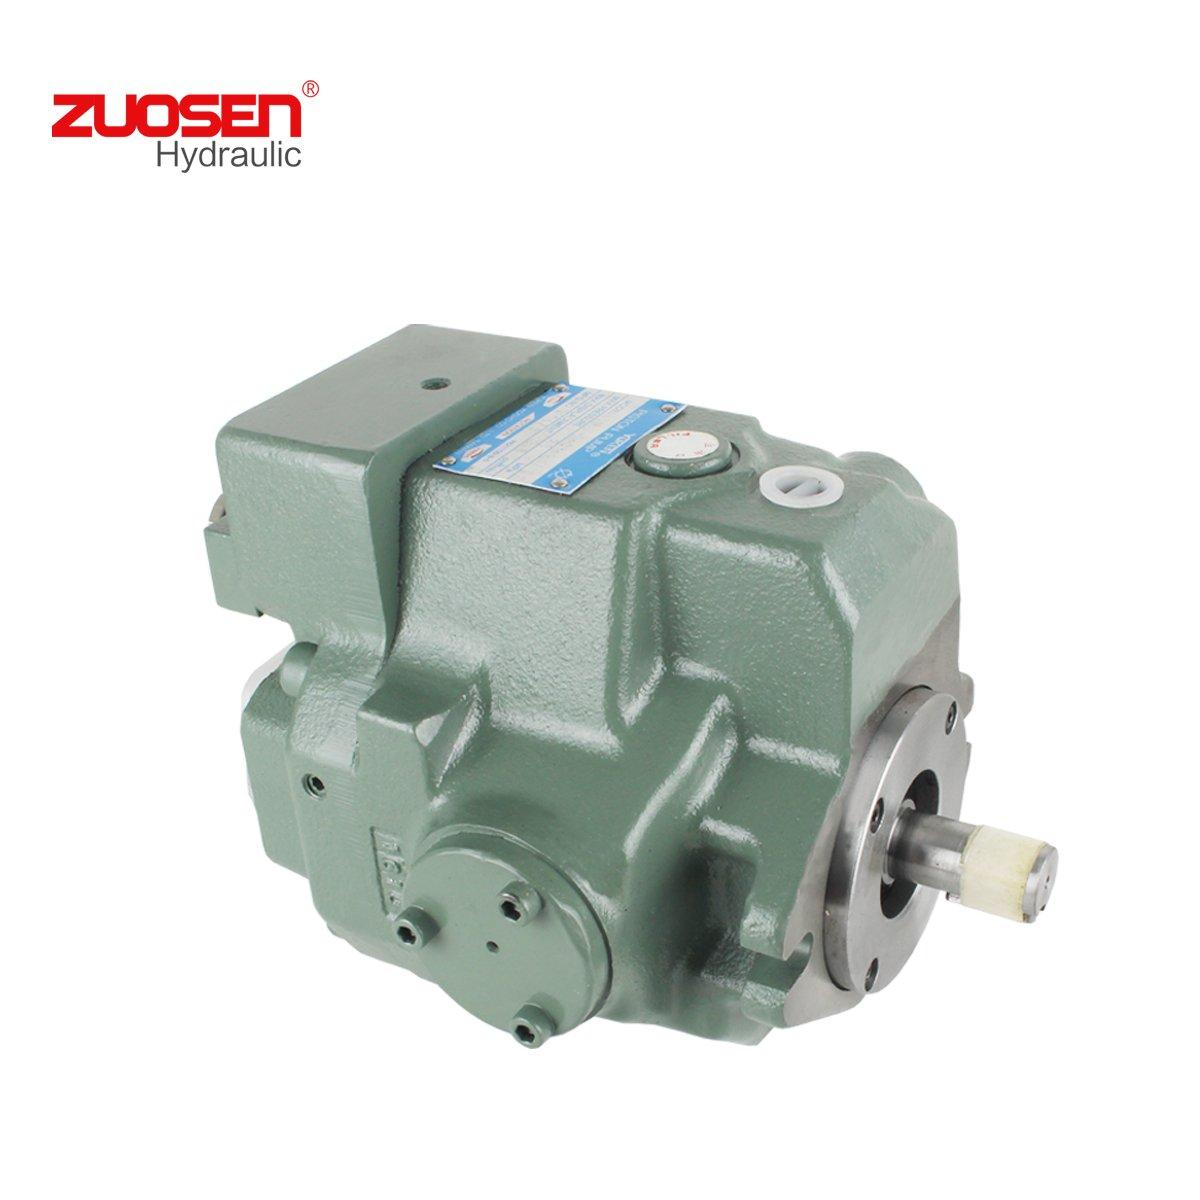 A16-F-R-01-C-K-32 Axial Piston Pump